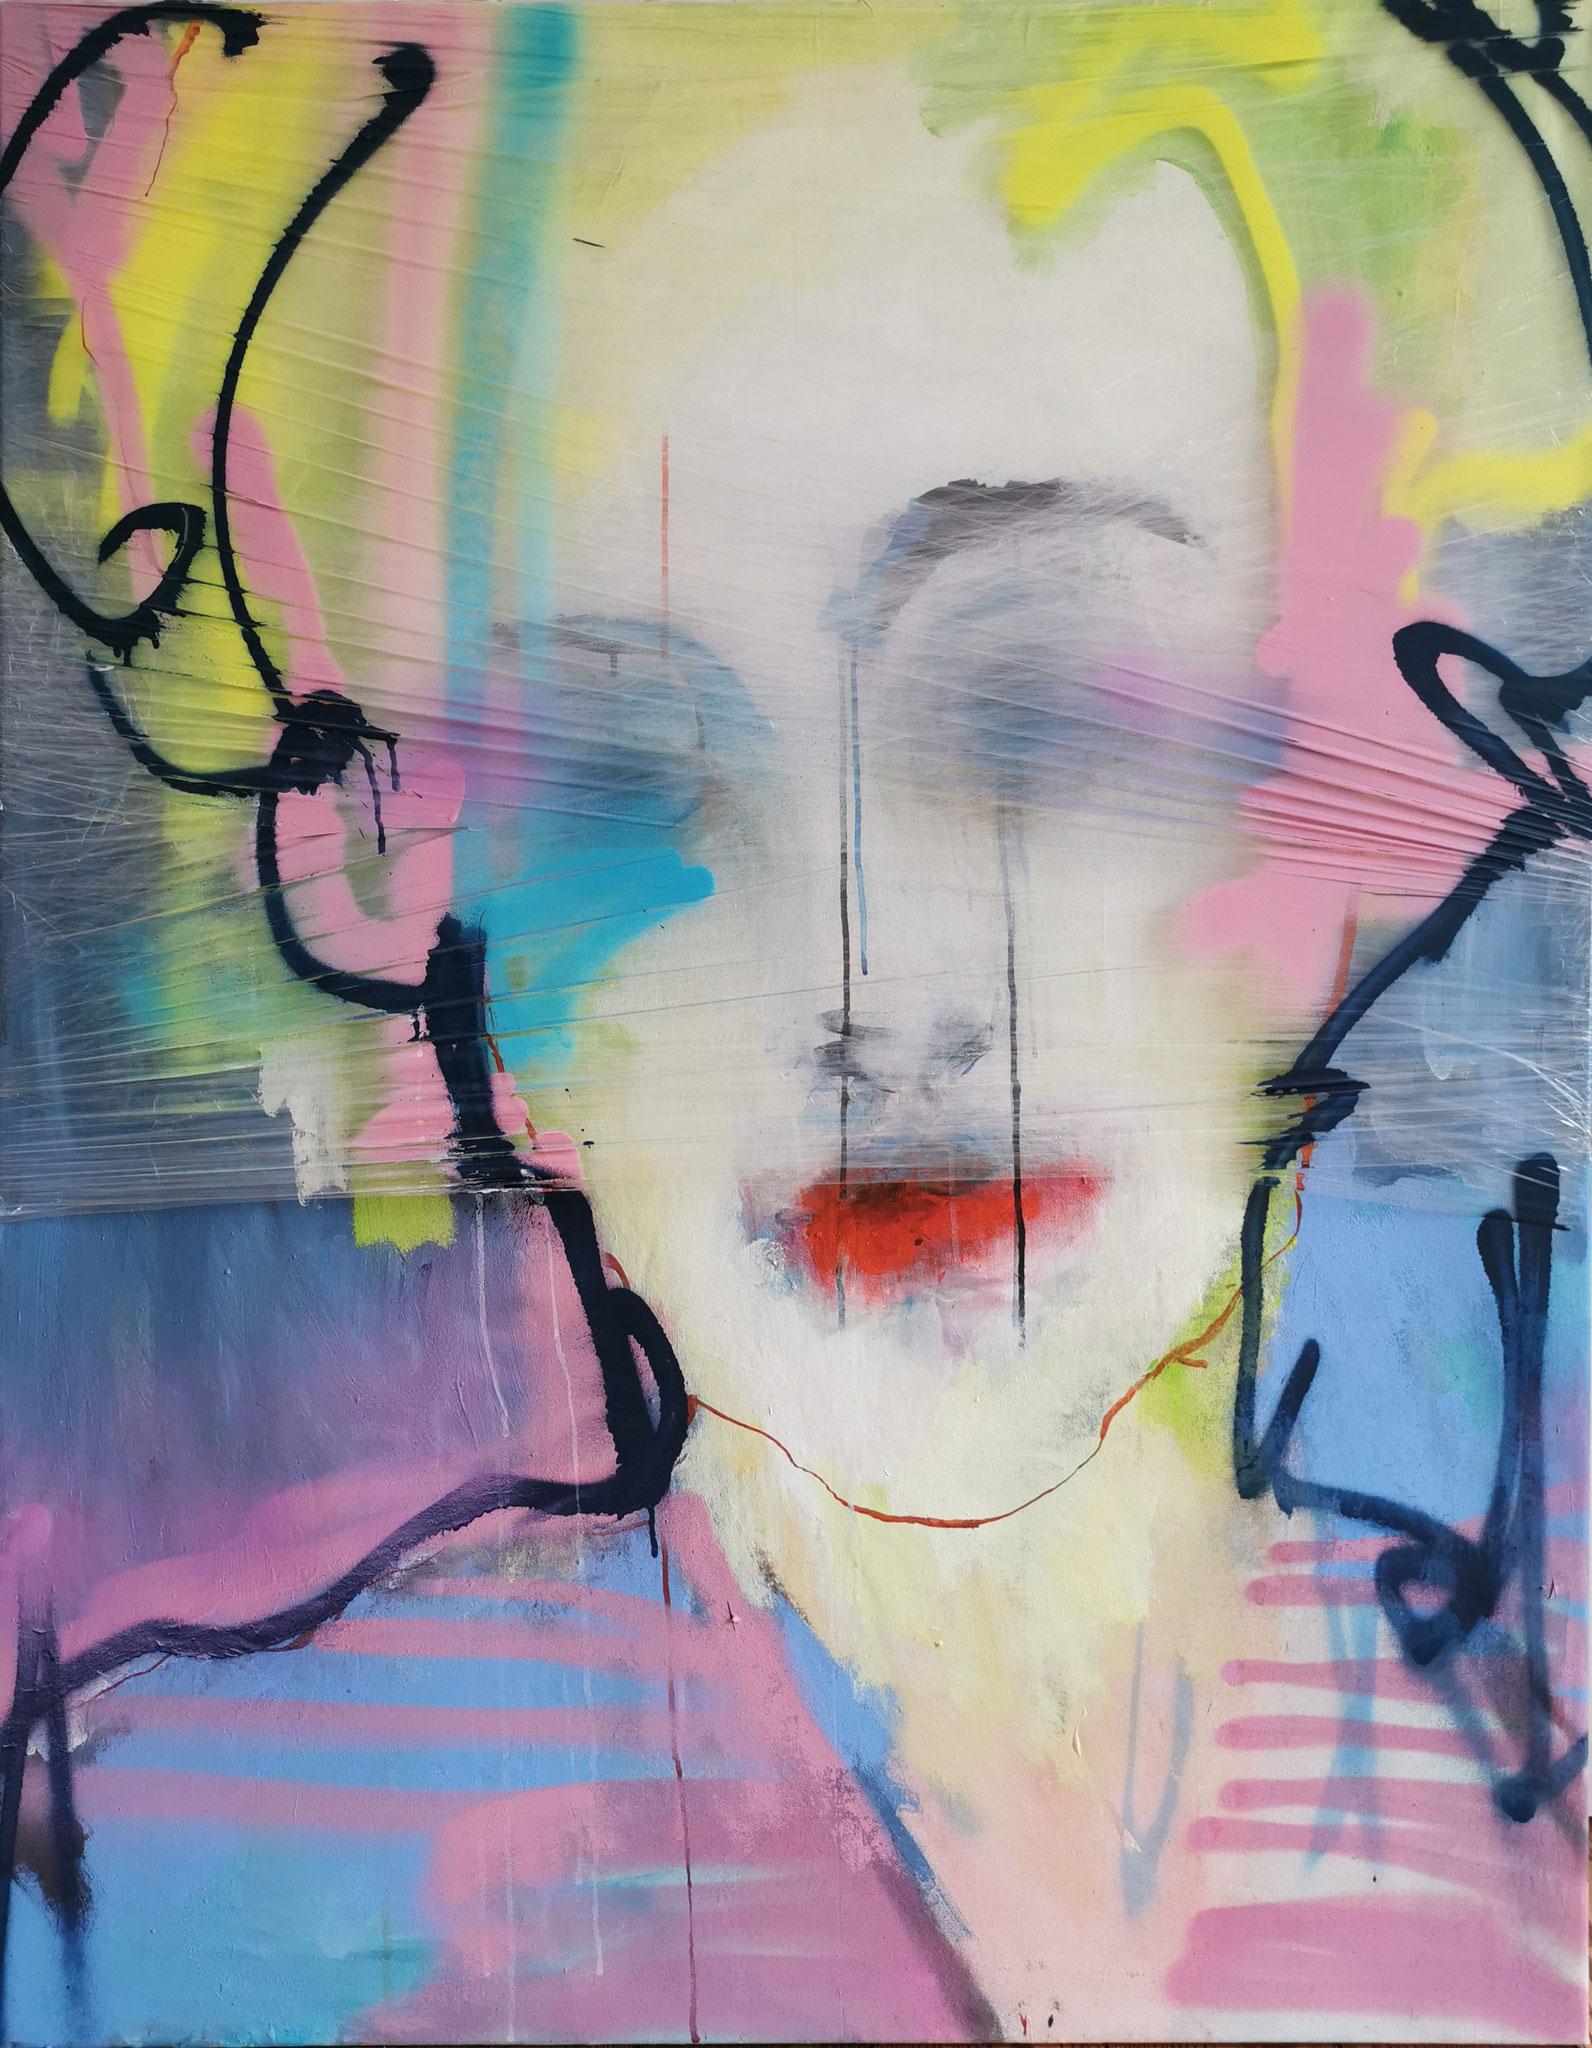 self-portrait (Acrylic, Plastic, Spray Paint, Graphite, Ink, Pastels on Plastic and Canvas , 130x100cm)